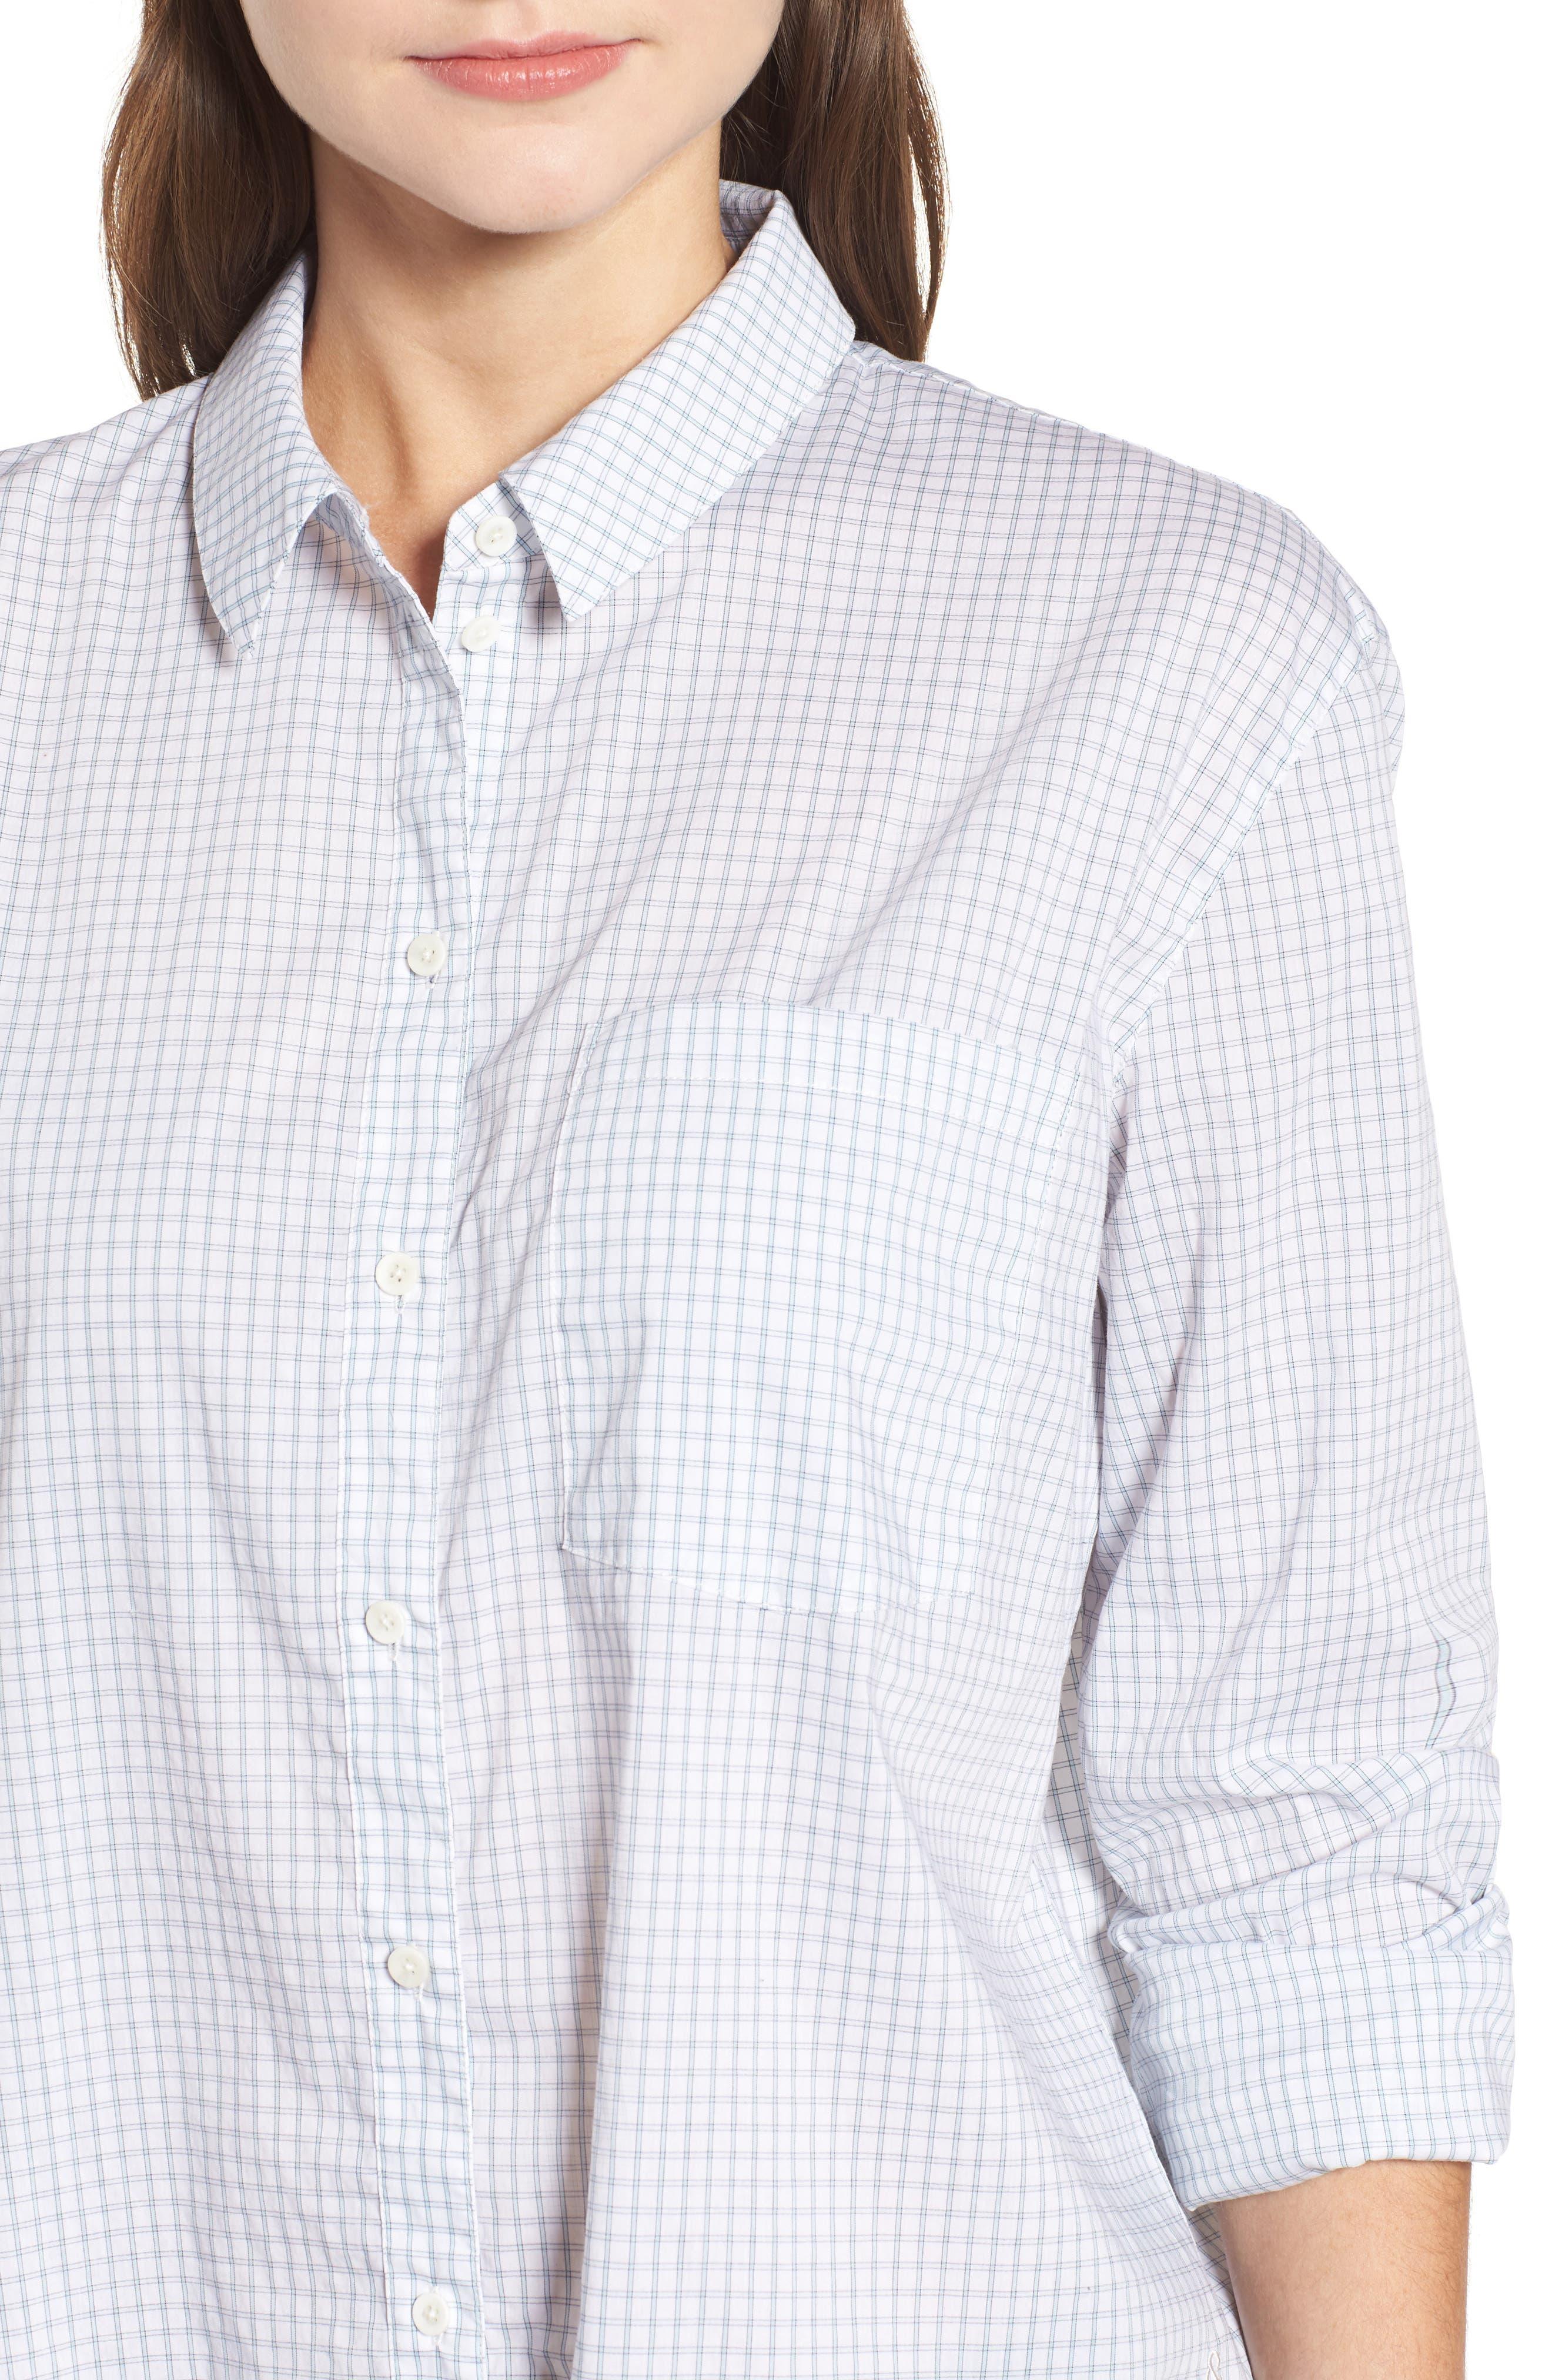 Oversize Check Shirt,                             Alternate thumbnail 4, color,                             White Blue Poplin Check